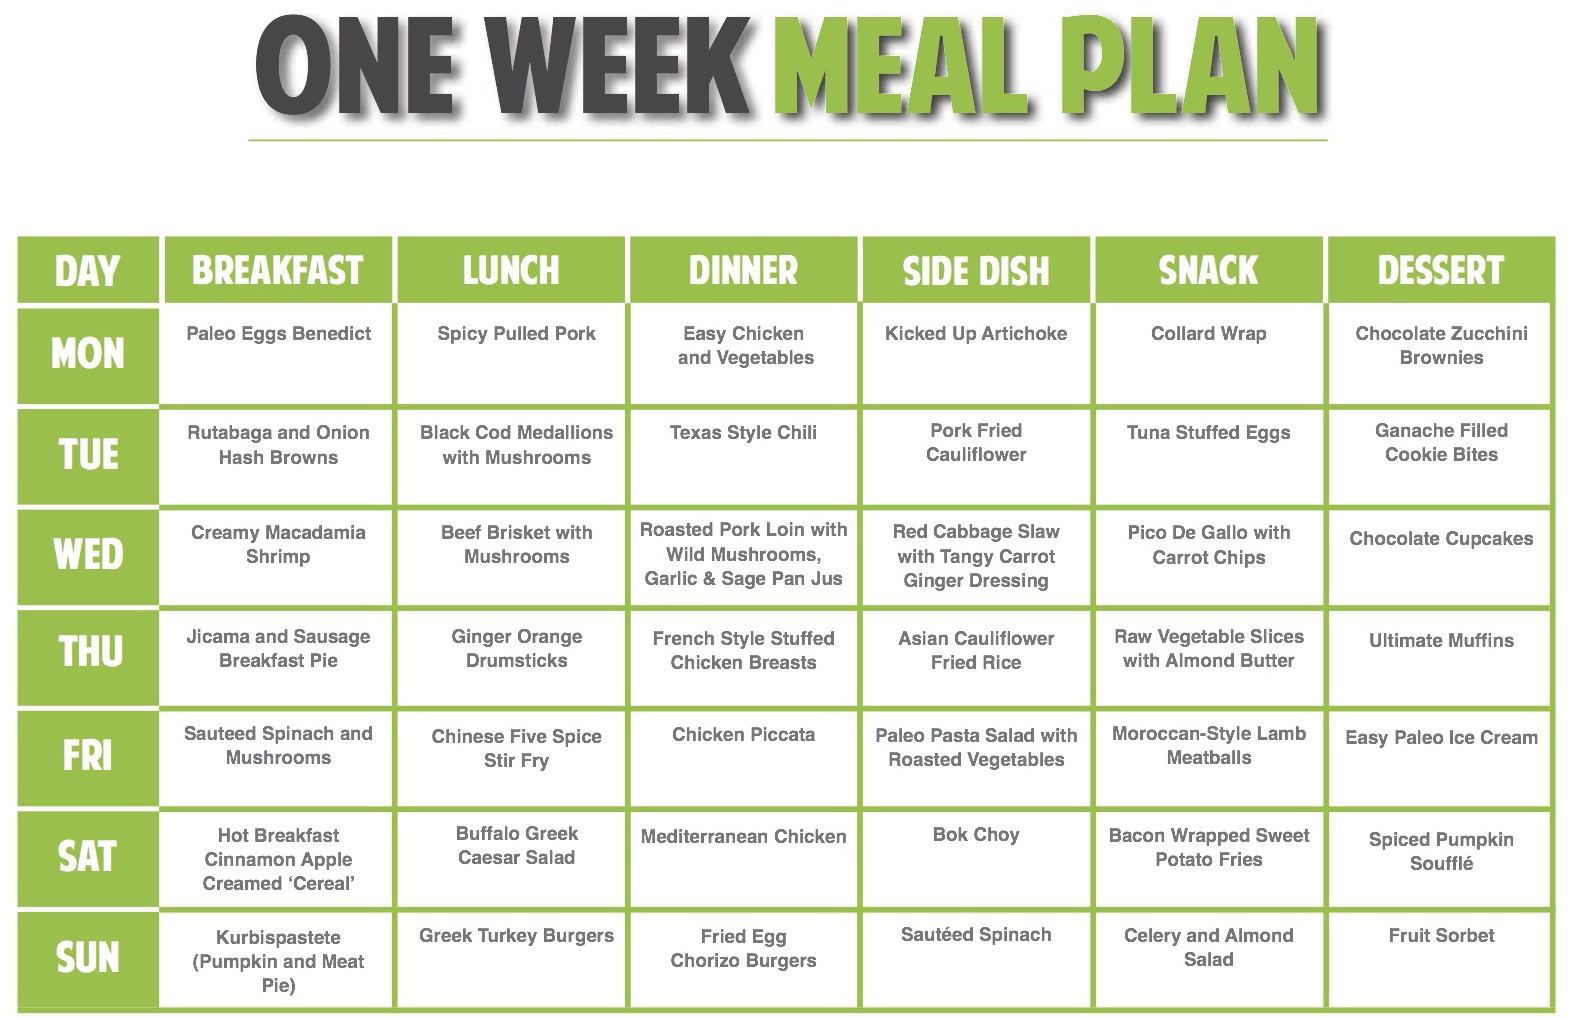 Low Carb Vegan Diet Plan  Low Fat Vegan Diet Plan For Weight Loss Diet Plan